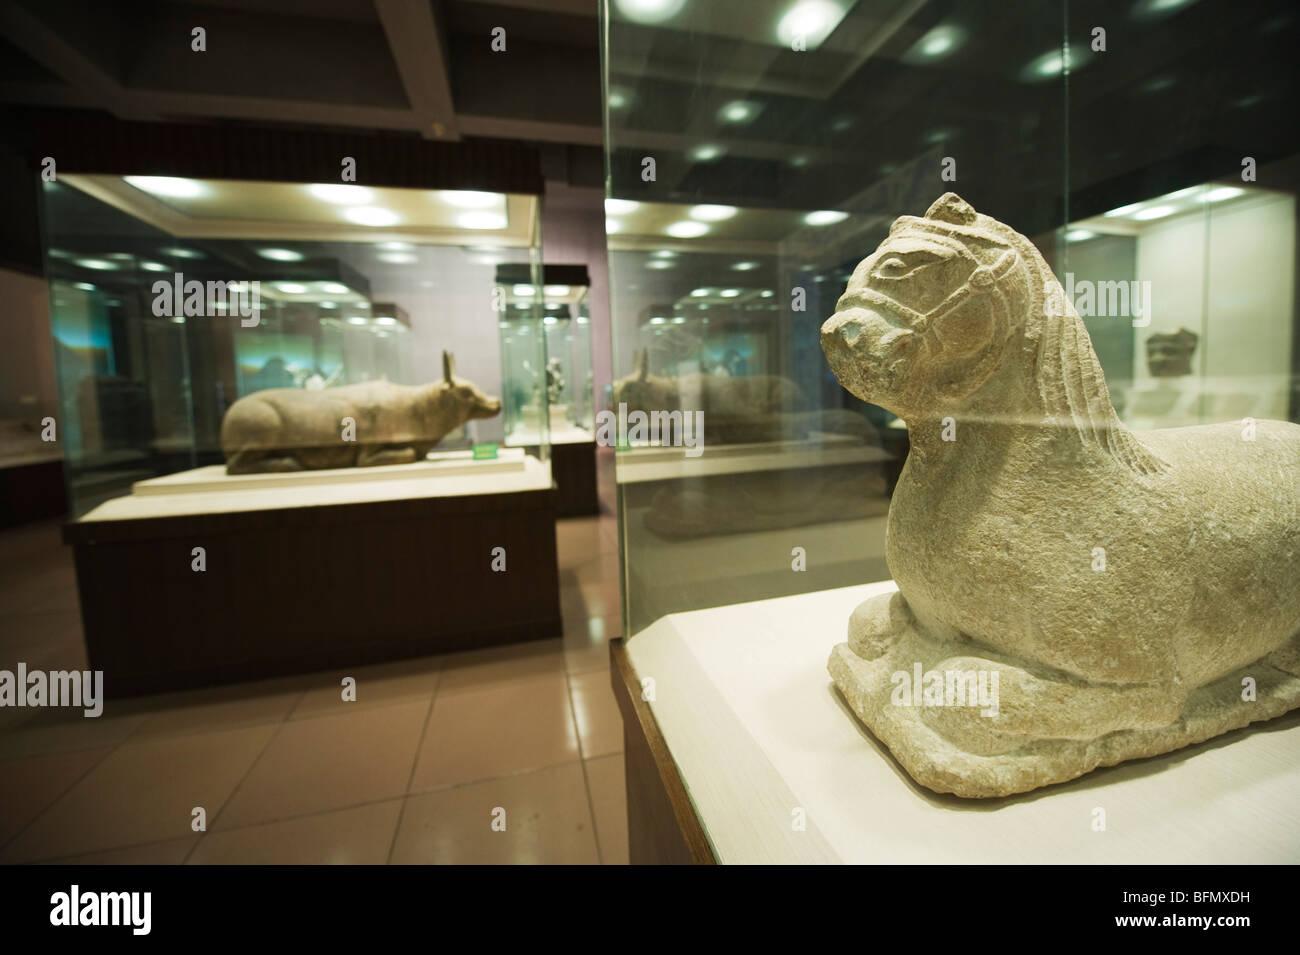 China, la provincia de Ningxia, Yinchuán, museo de las tumbas Xia occidental Foto de stock